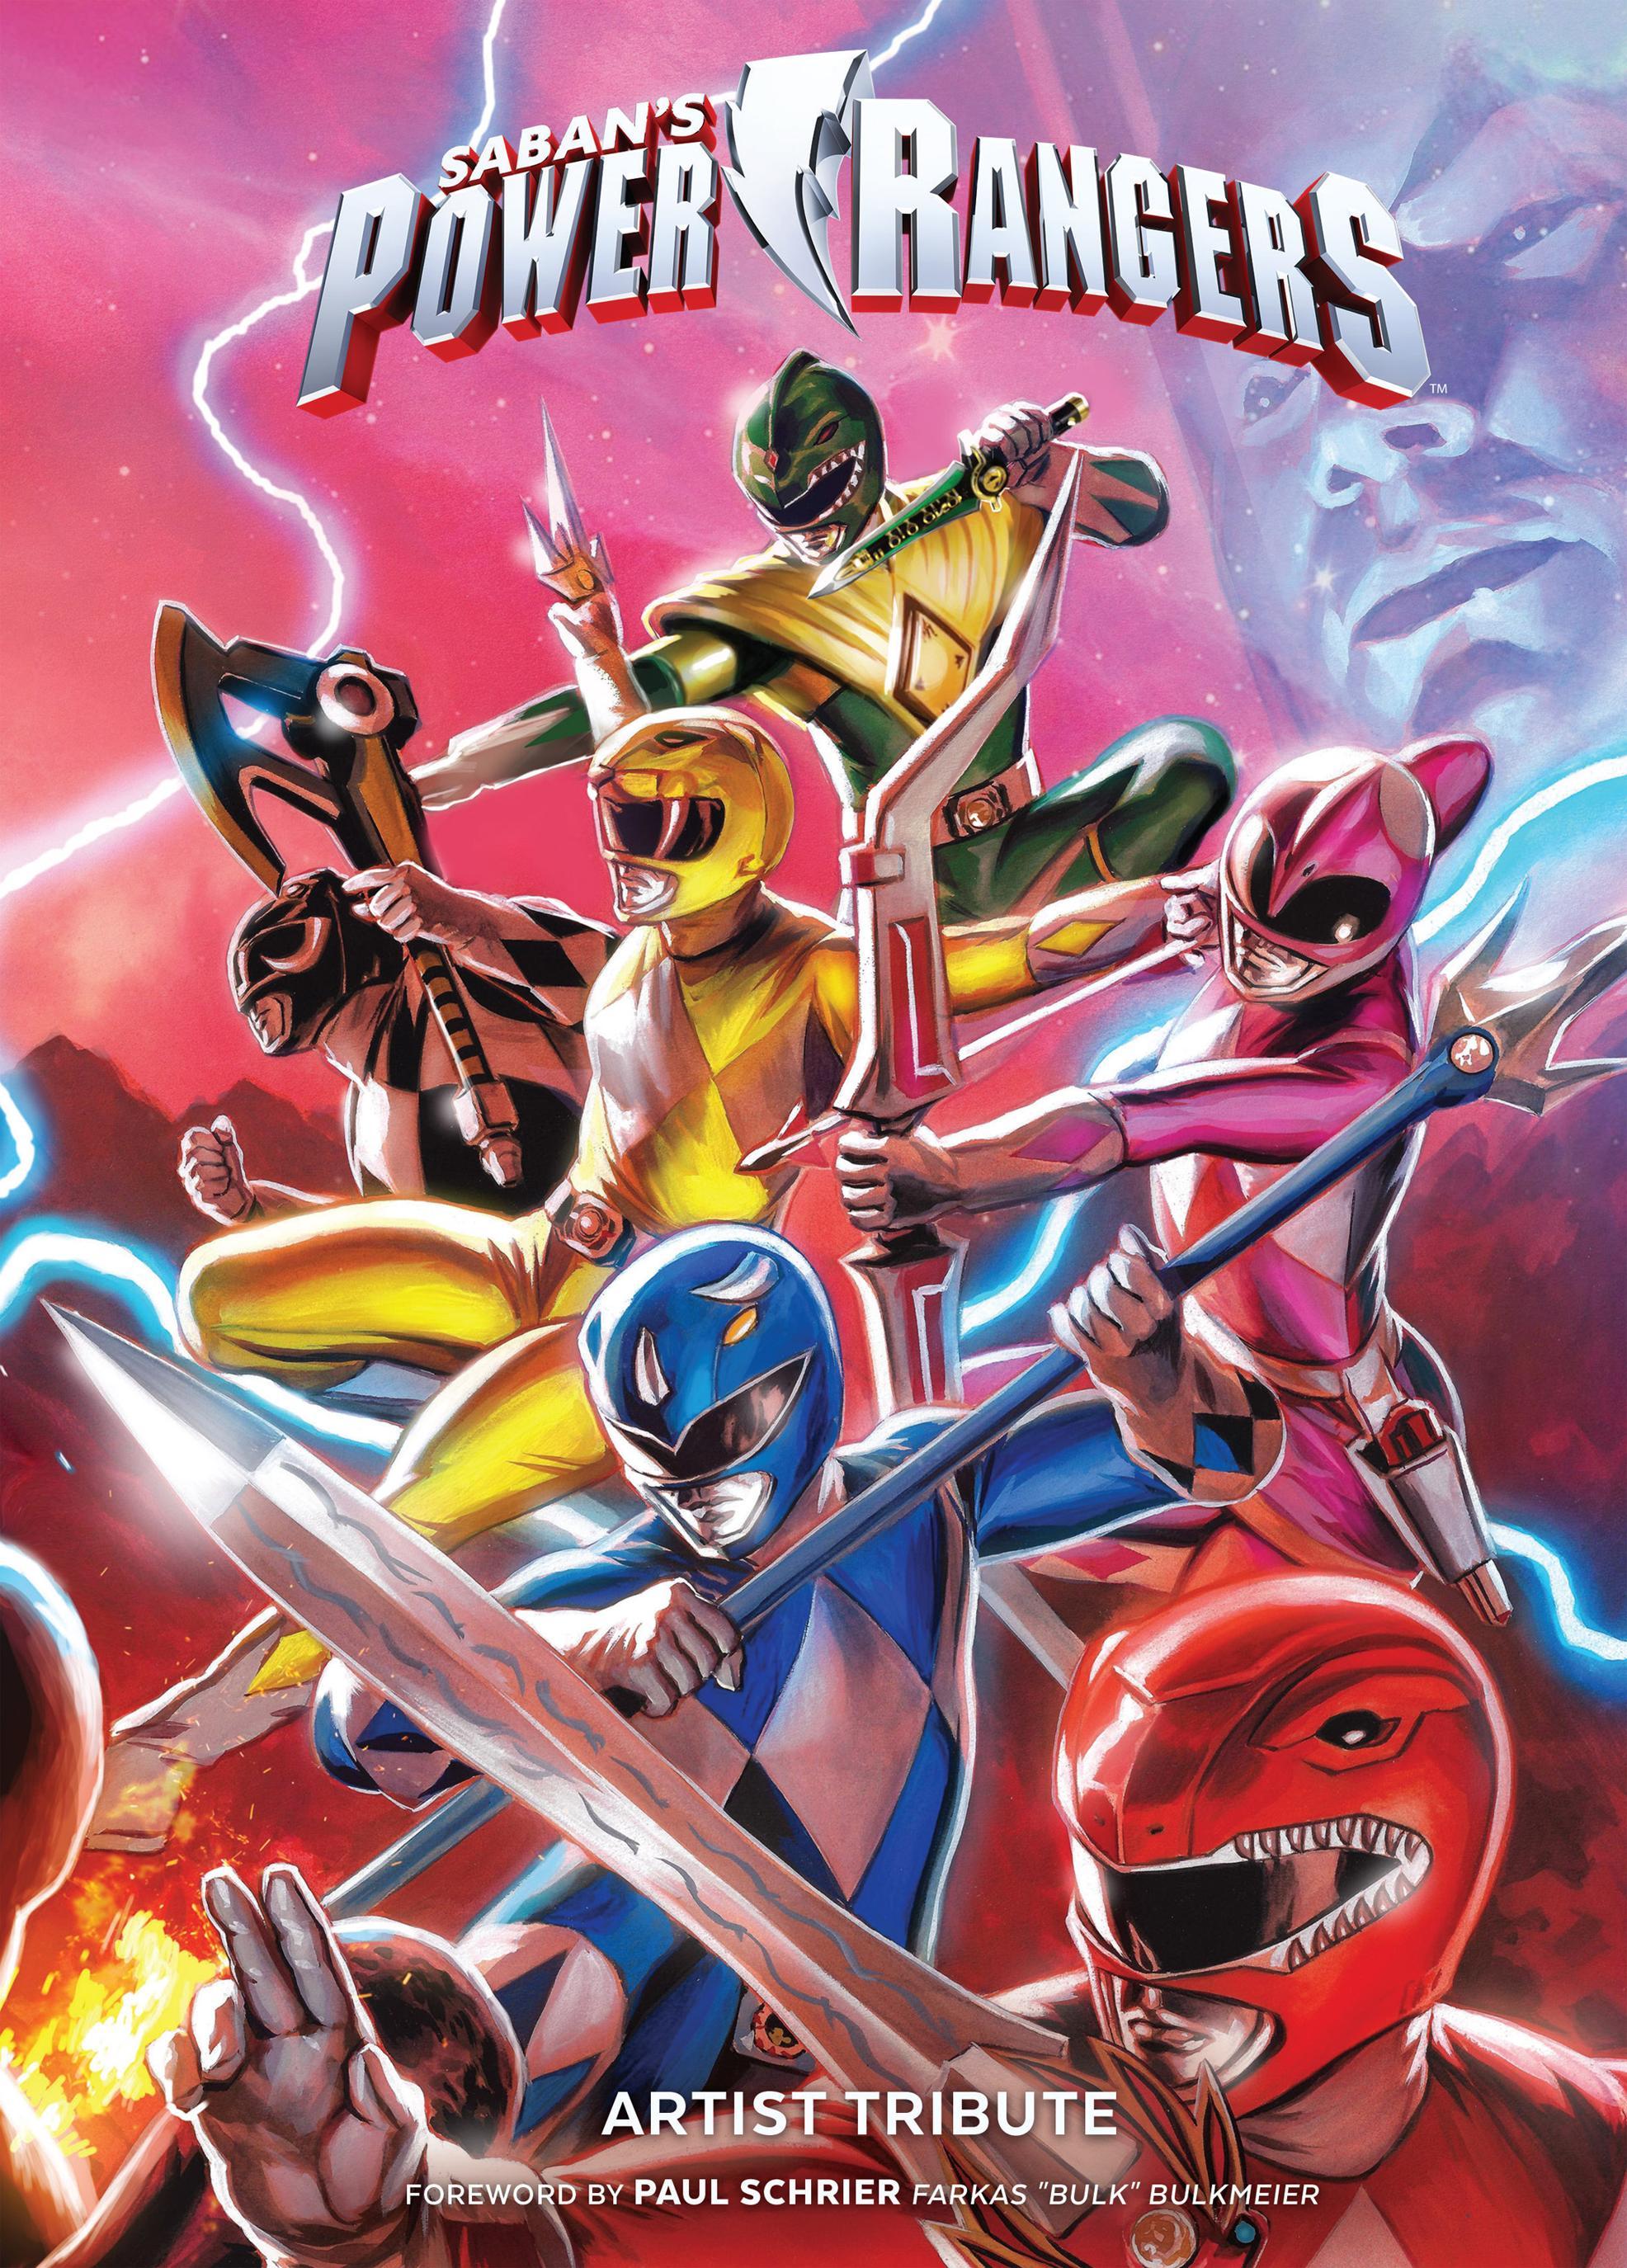 Sabans Power Rangers Artist Tribute (2018) (Digital) (Kileko-Empire